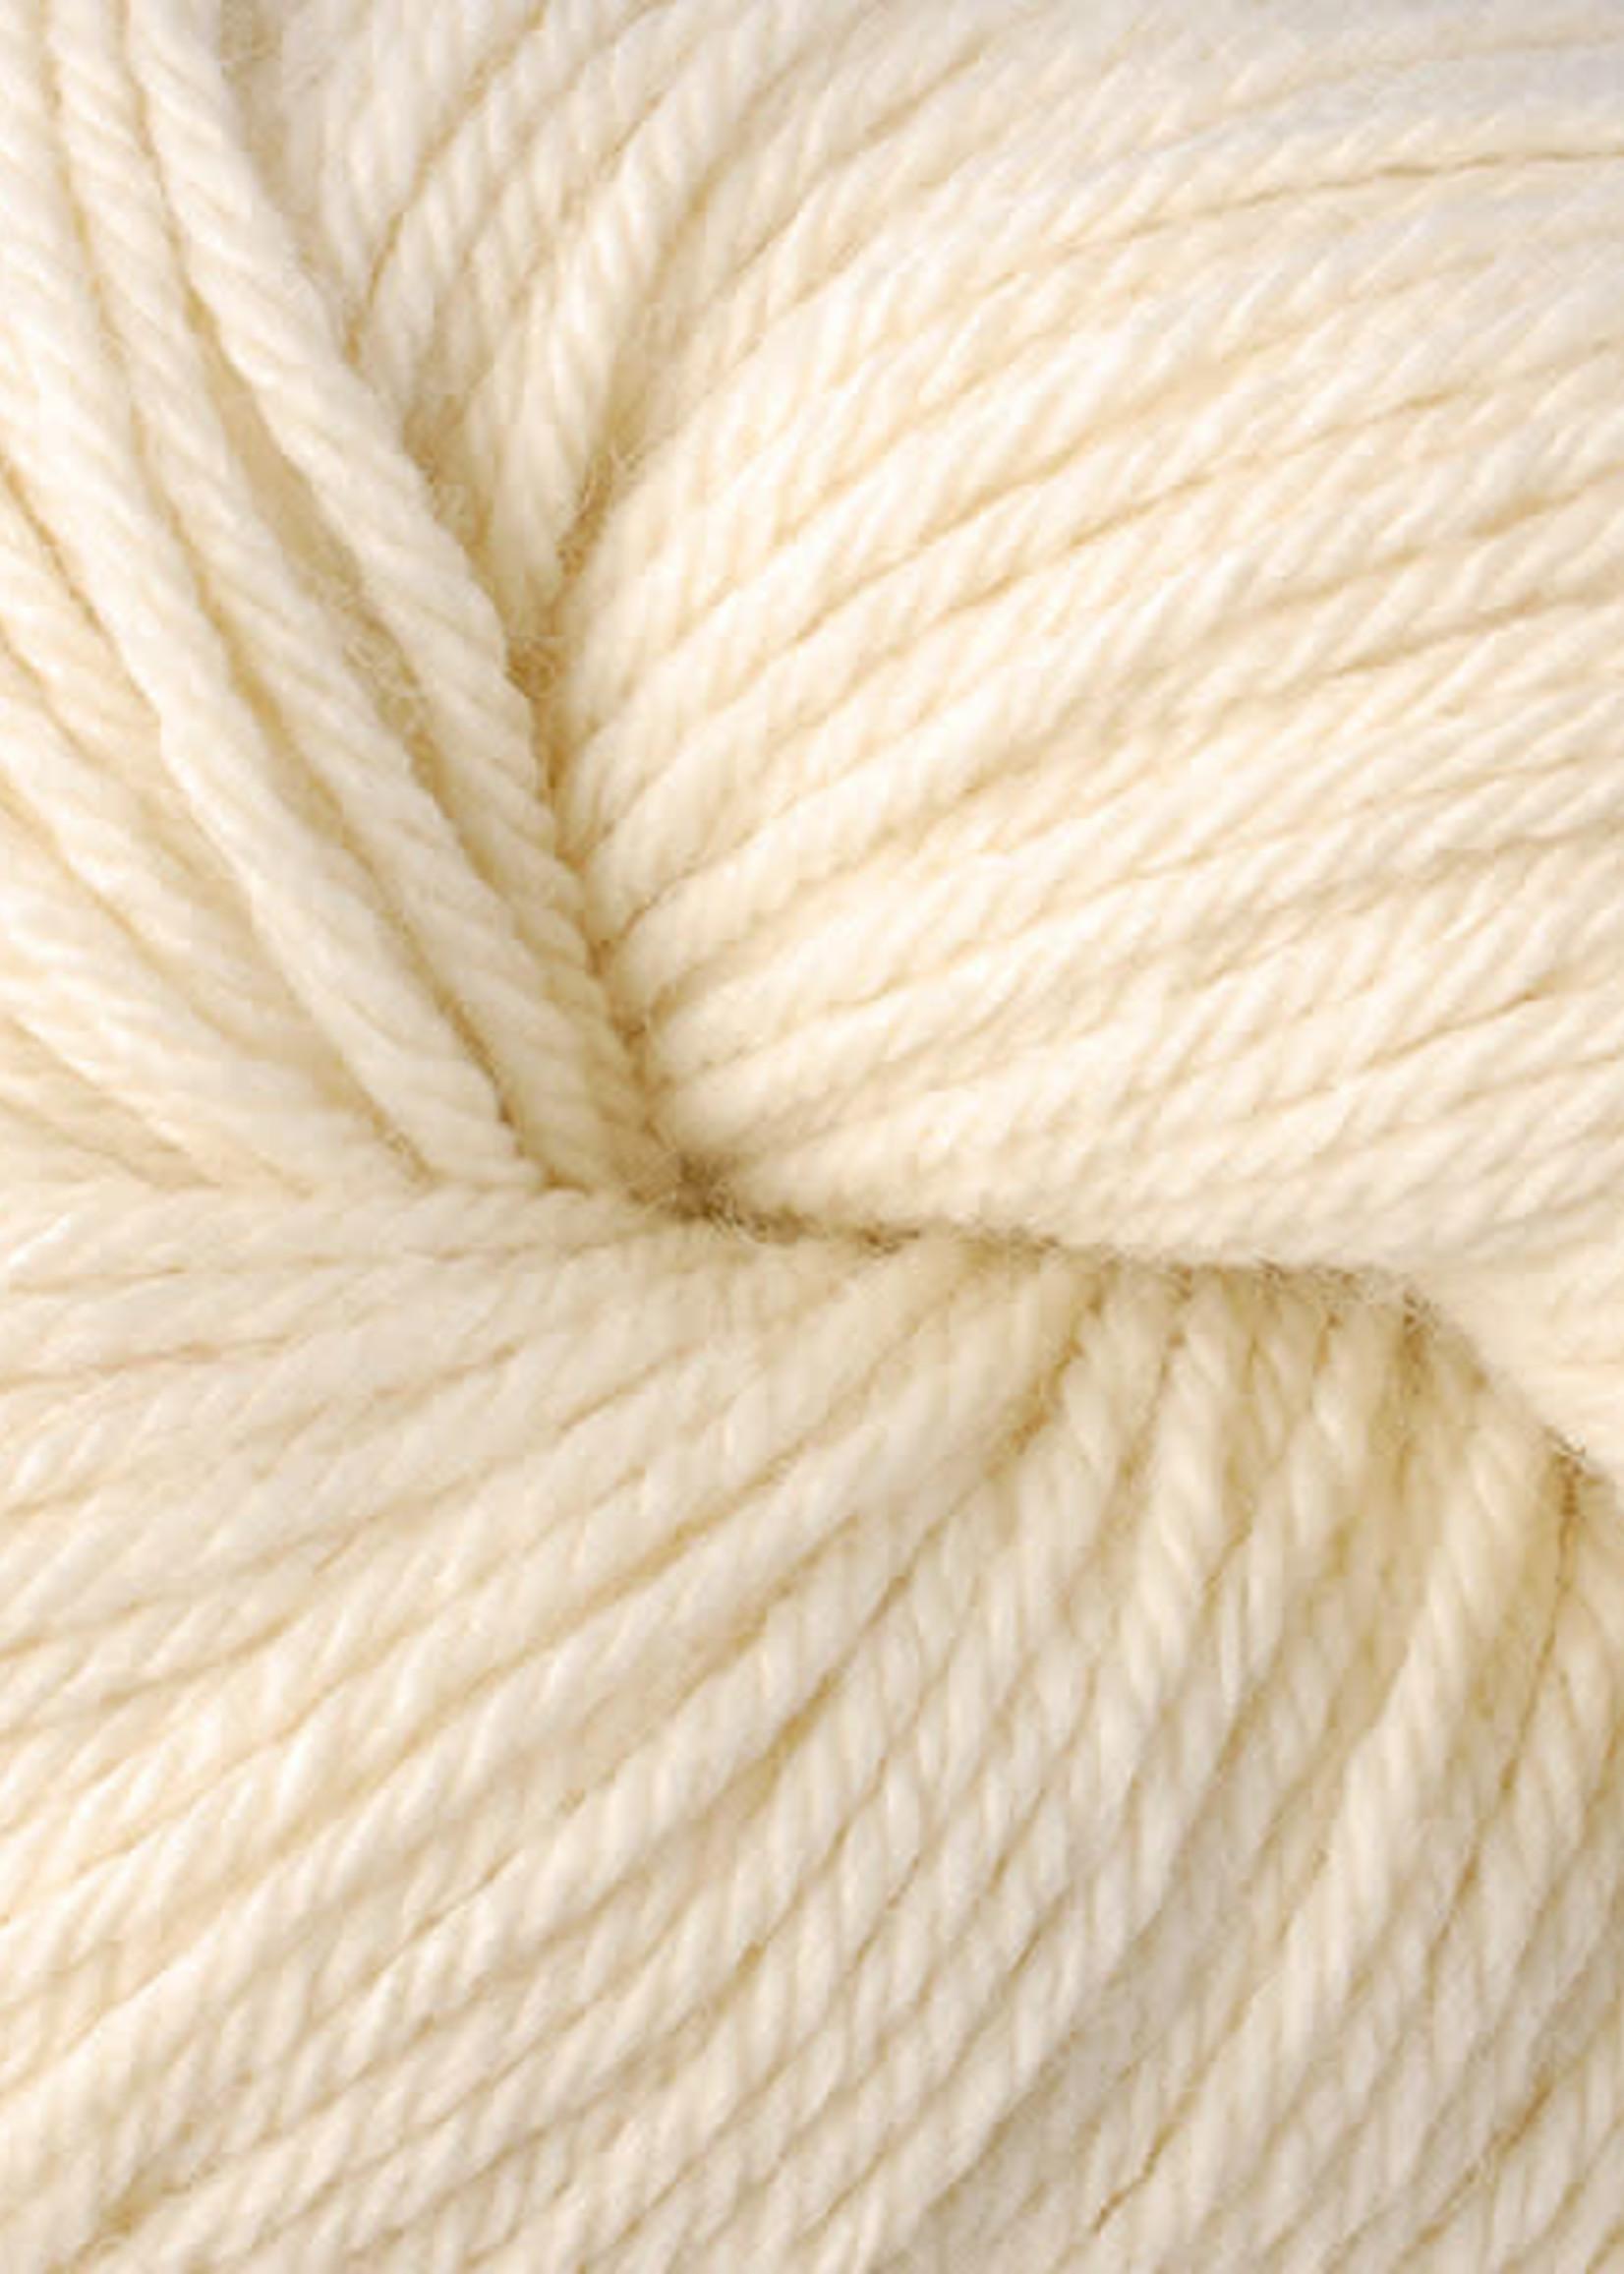 Berroco Berroco Vintage Yarn #5102 Buttercream